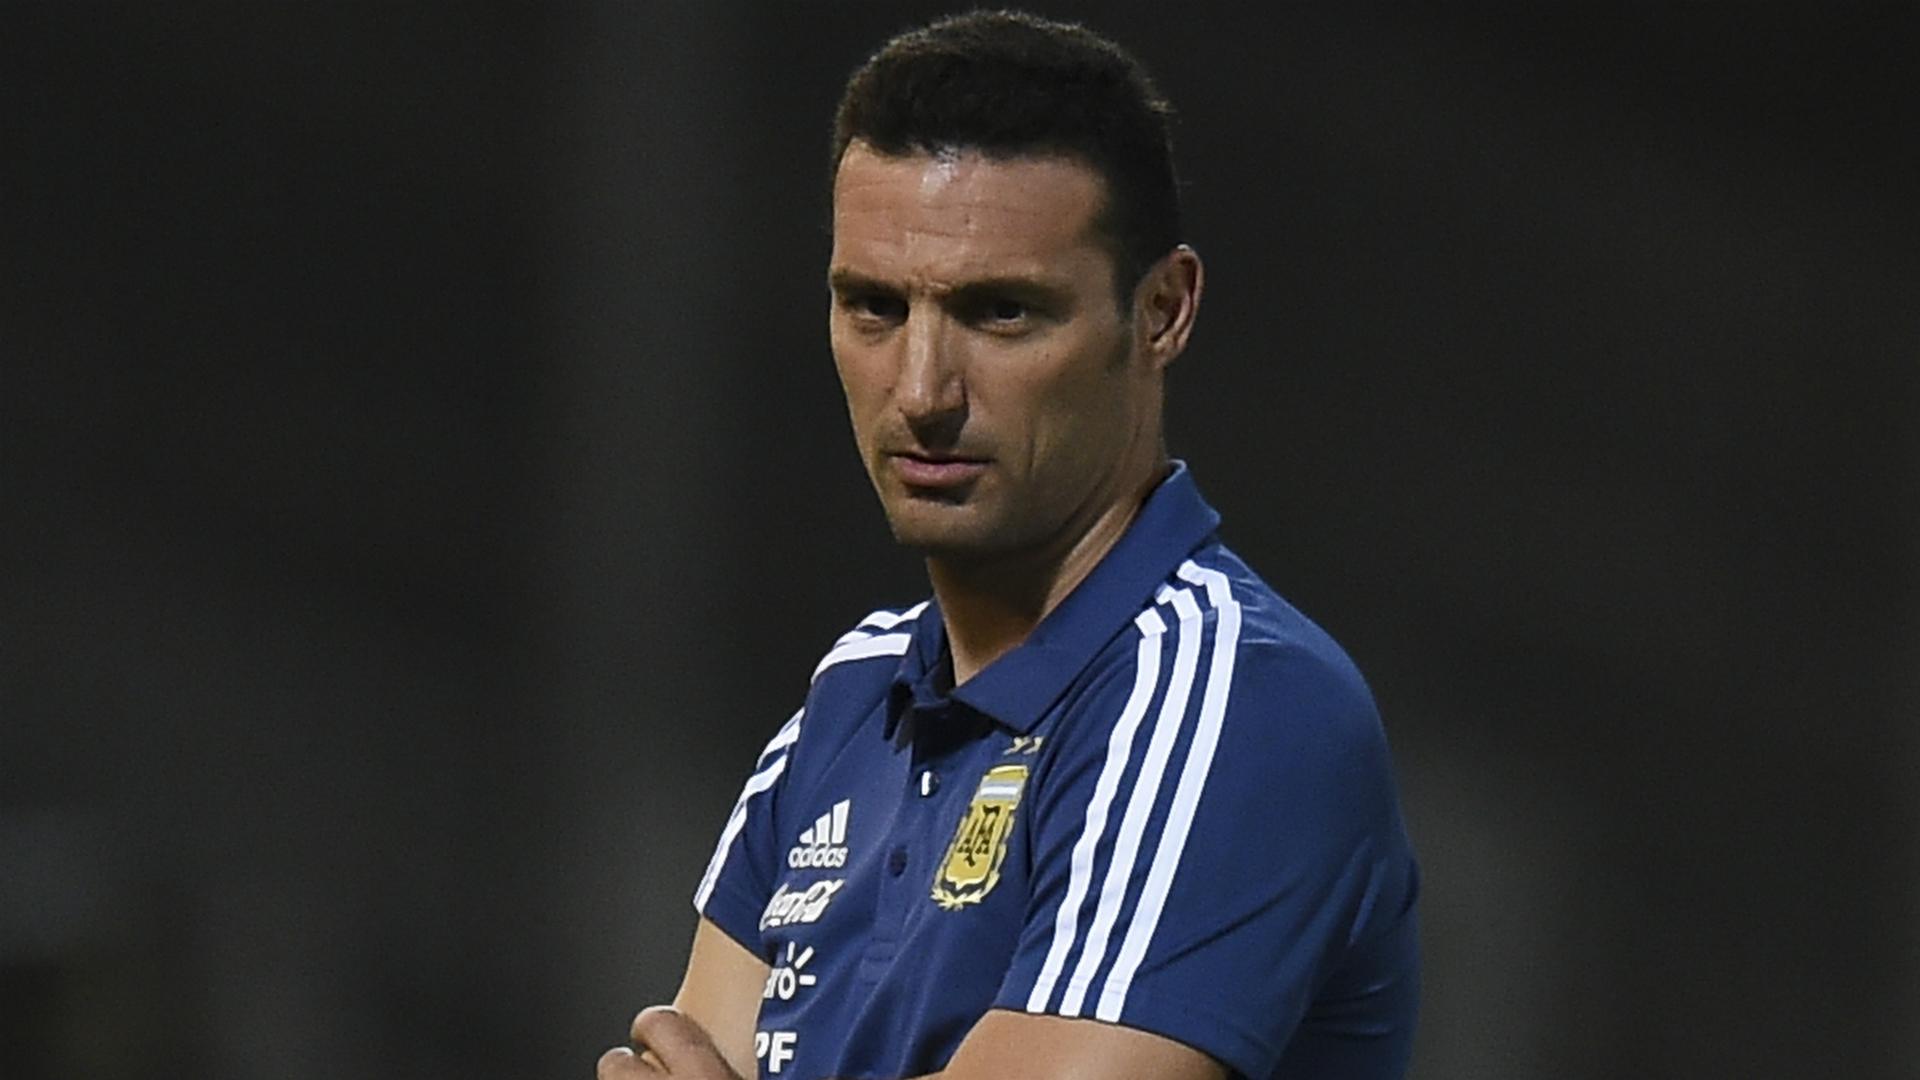 Lionel Messi, Sergio Aguero in Argentina's squad for Copa America